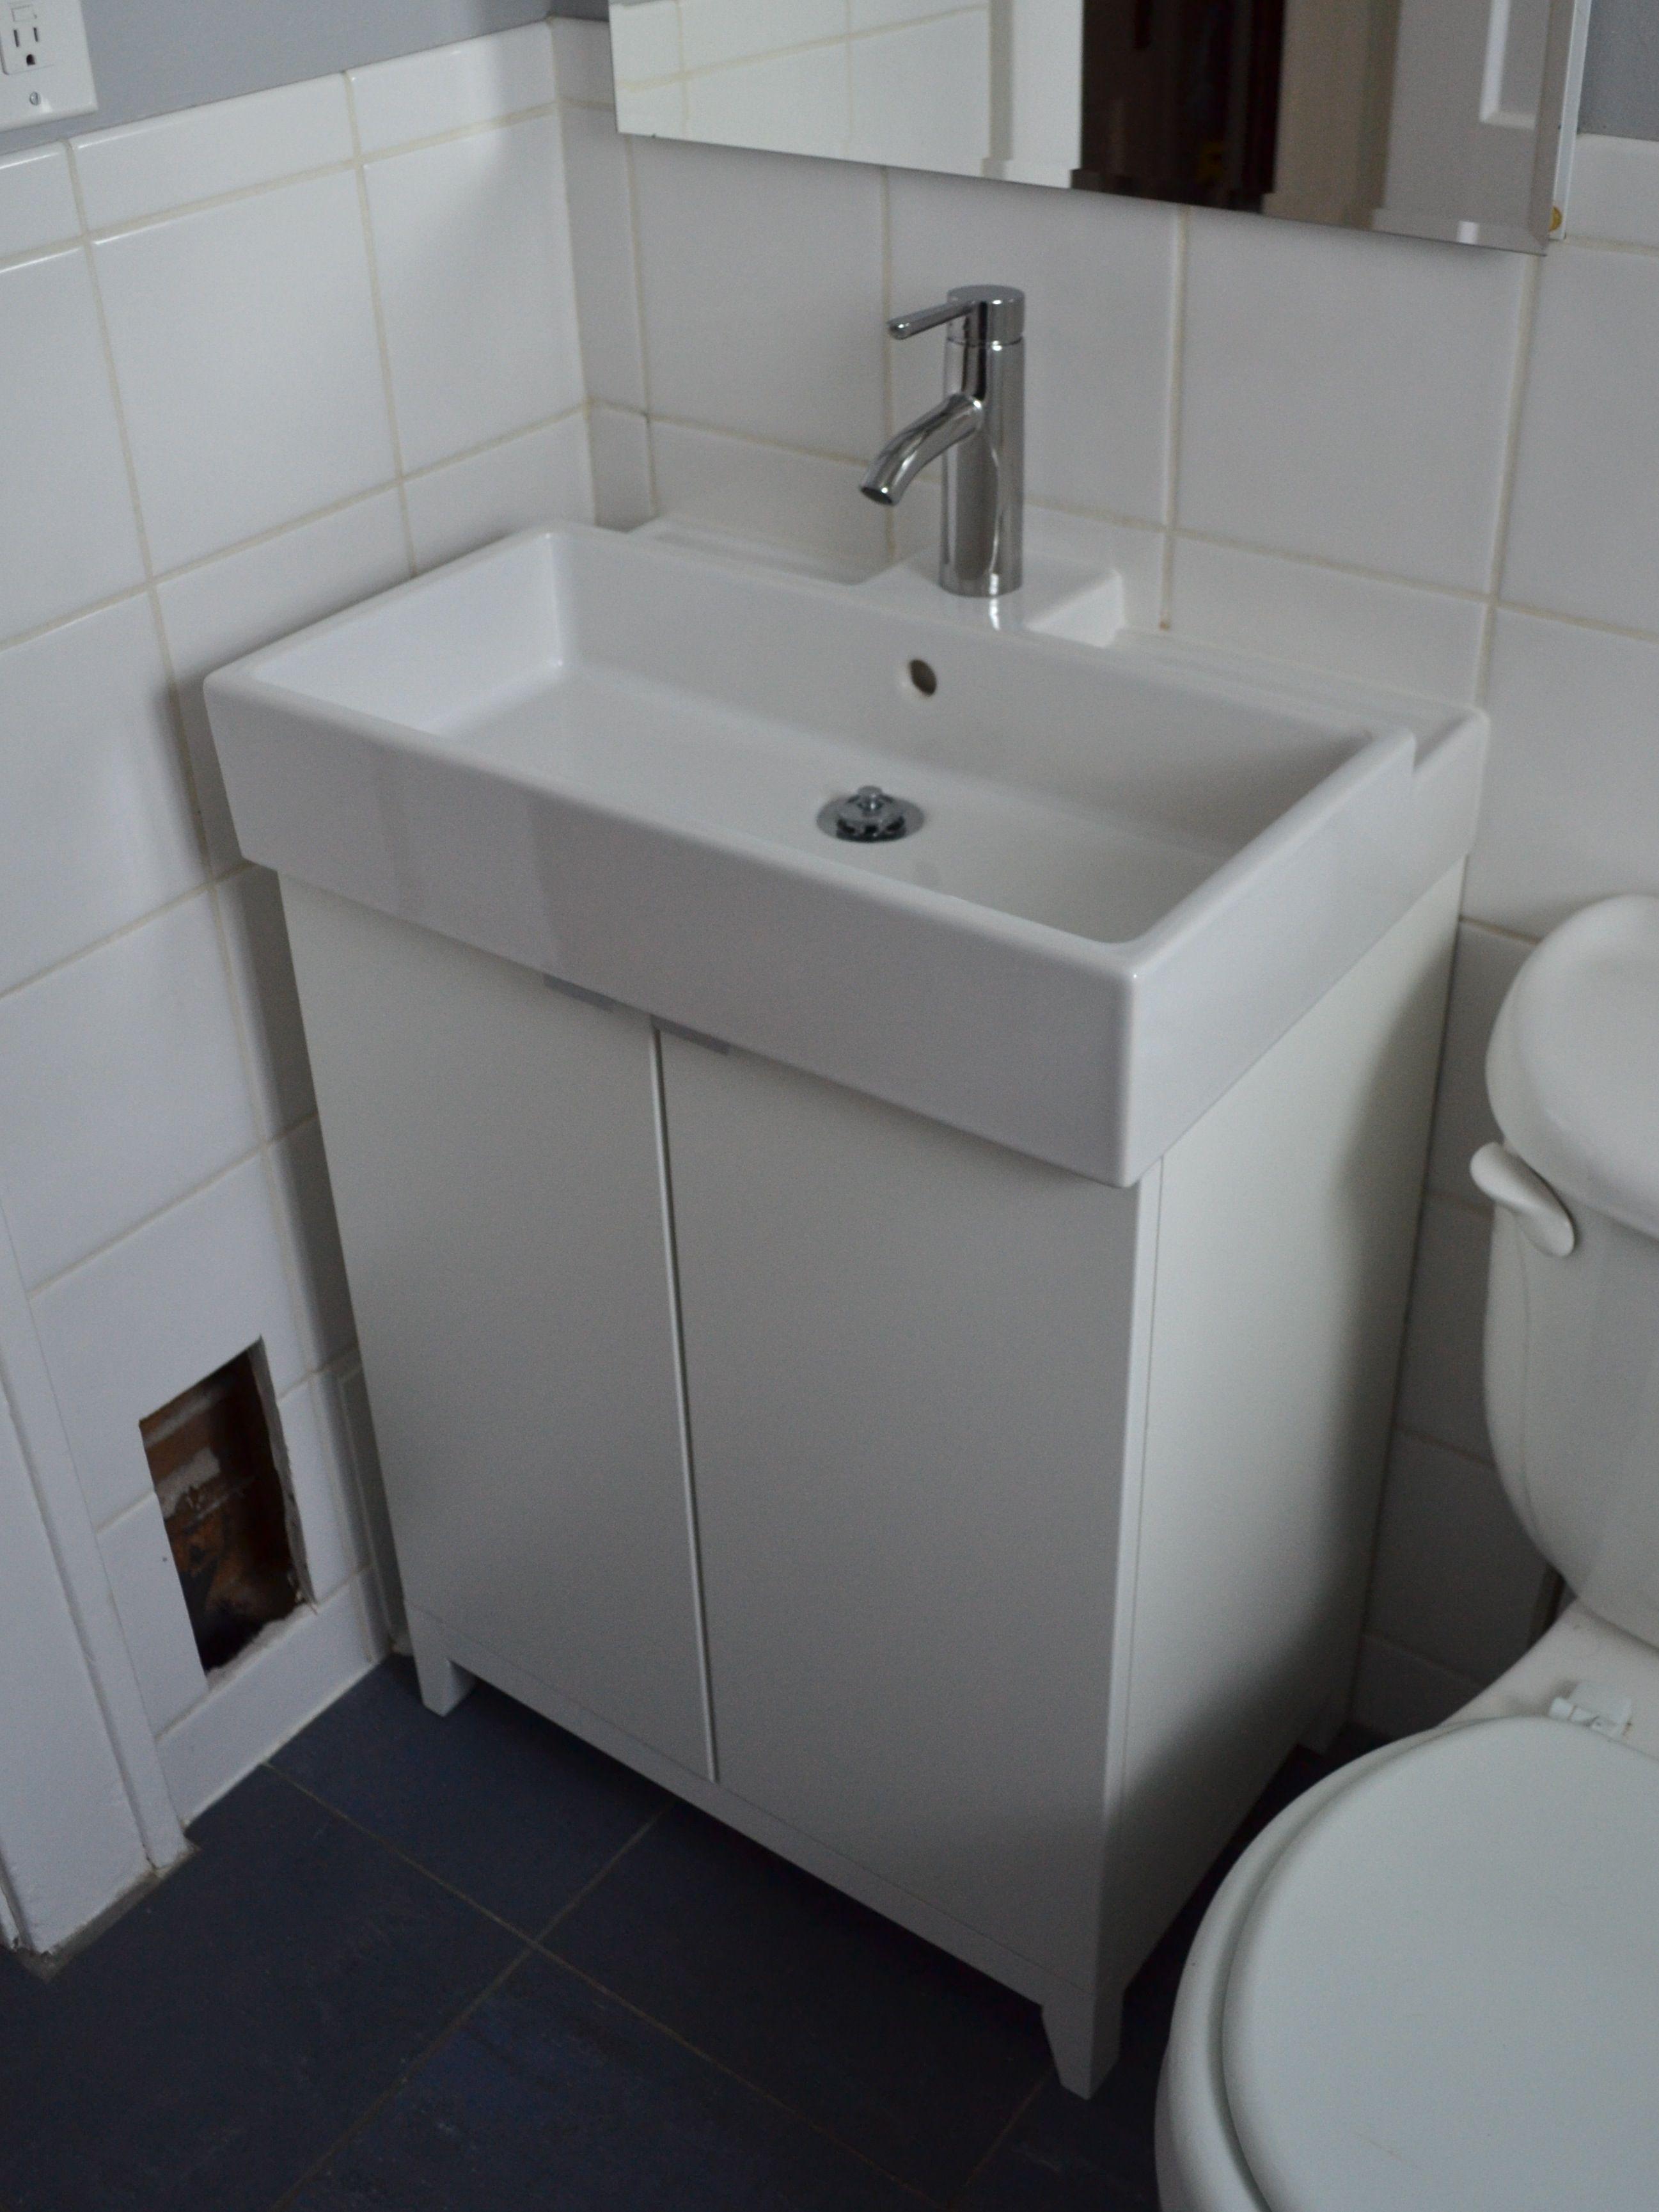 Small bathroom sinks ikea - Ikea Lillangen Sink And Cabinet Ashandorange Wordpress Com